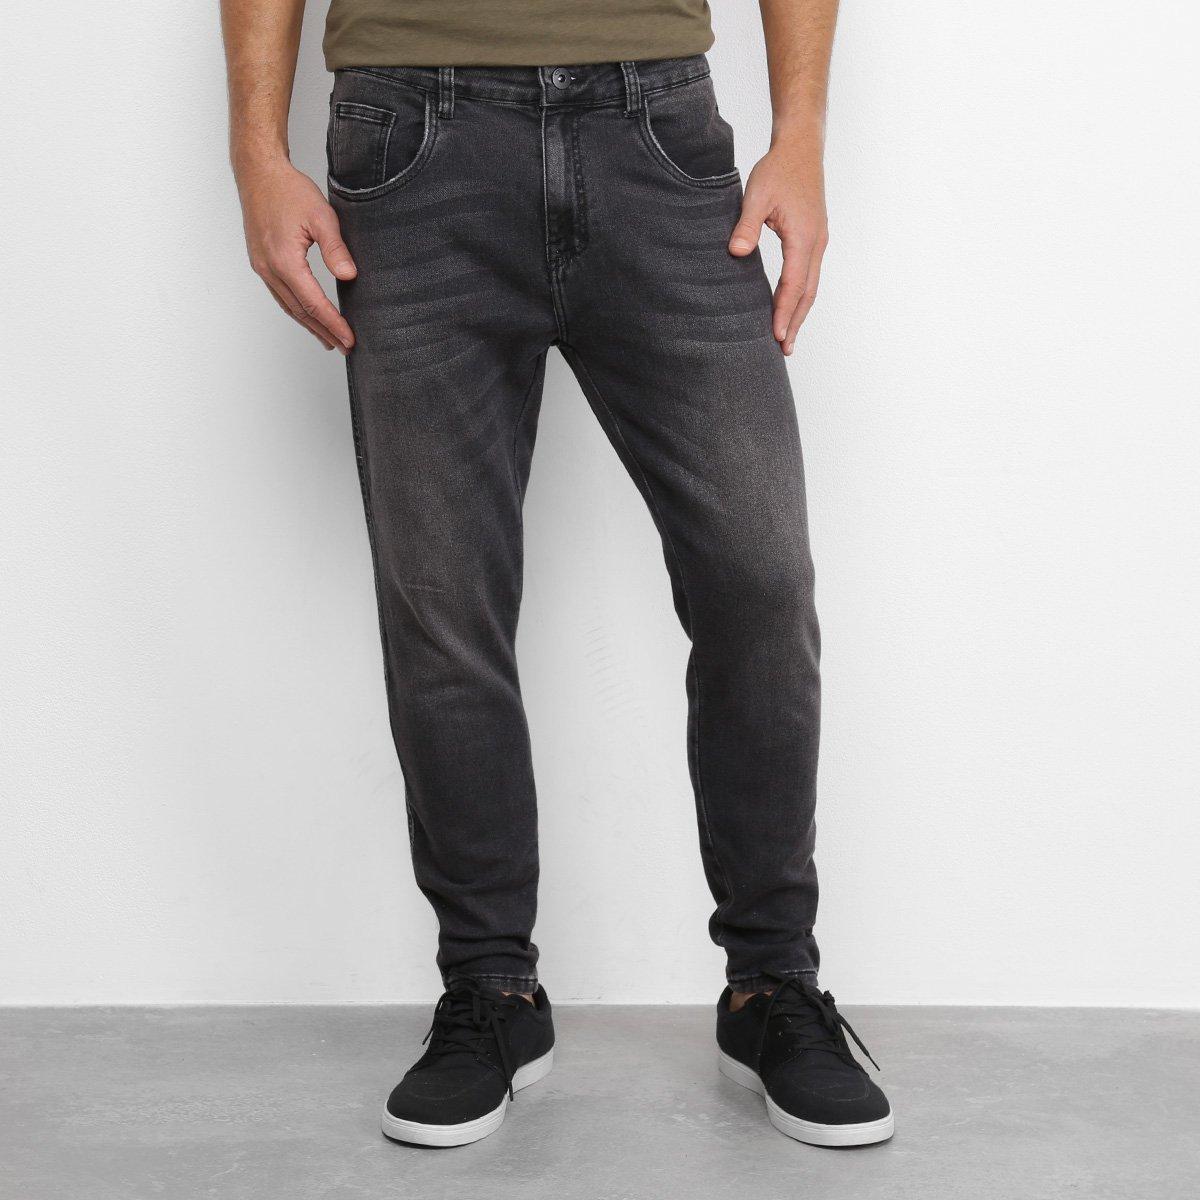 Calça Jeans Oakley Denim Fleece Masculina